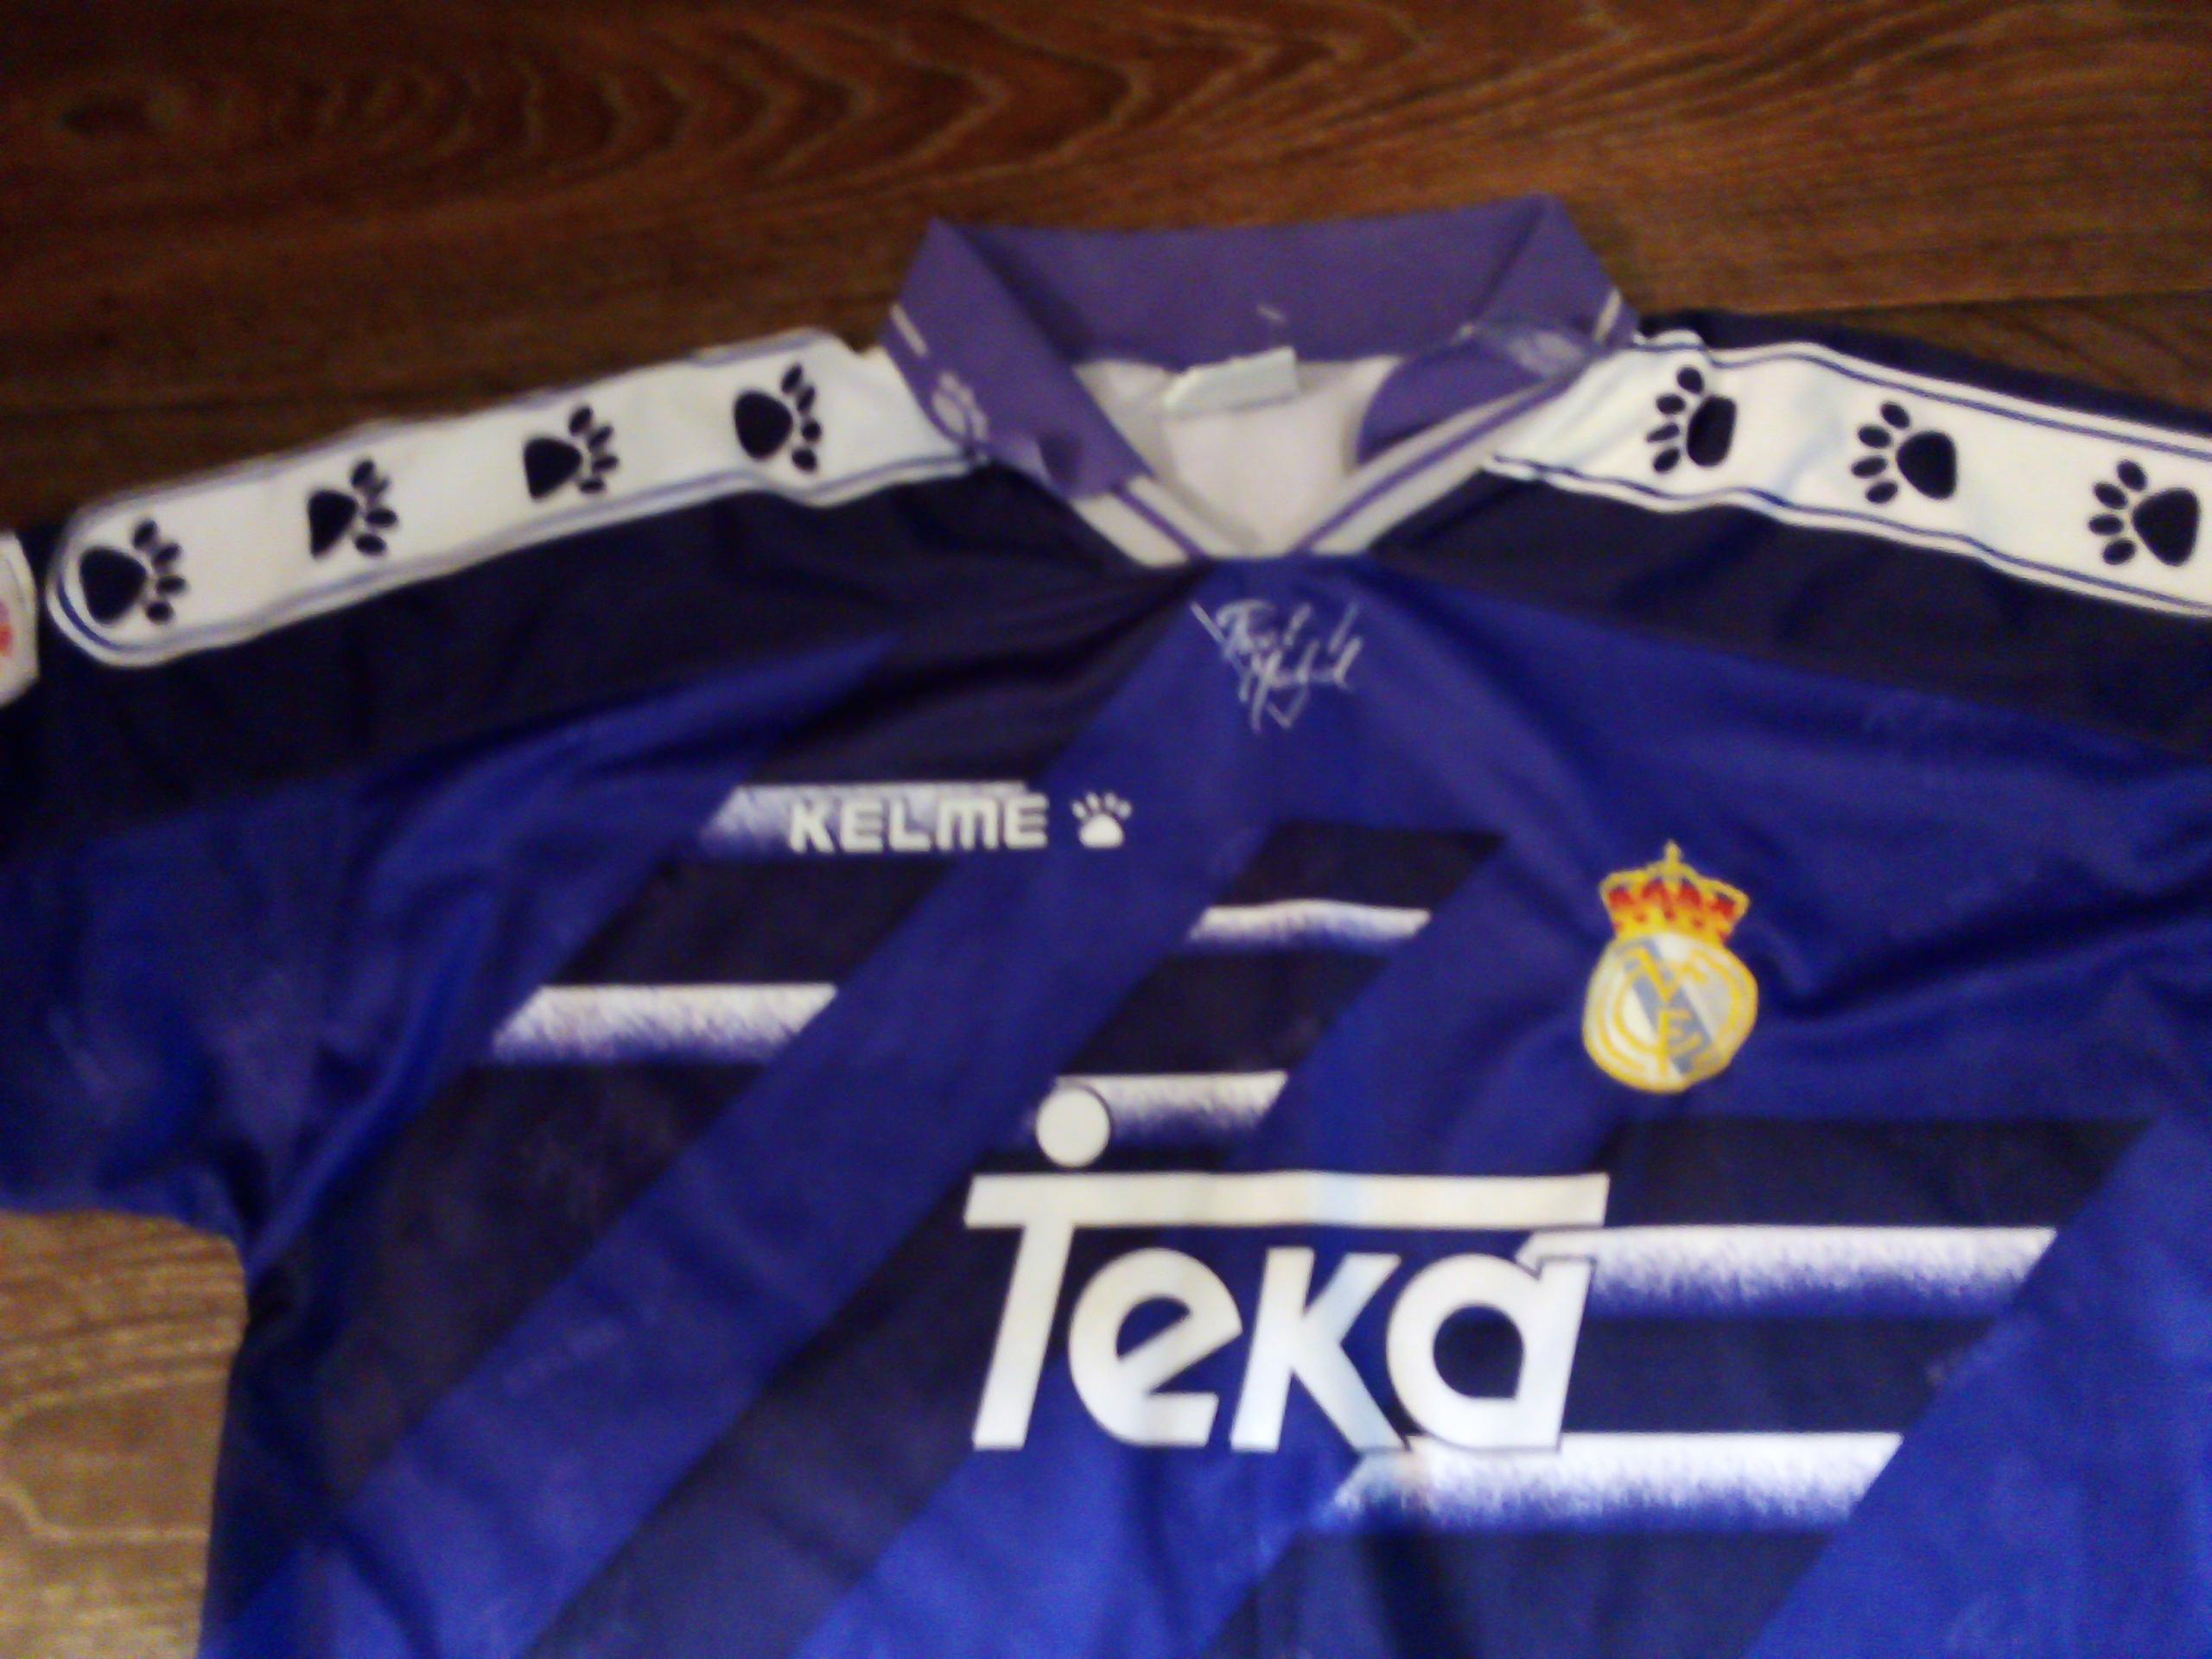 Koszulka Real Madryt kelme XL ? oldschool retro